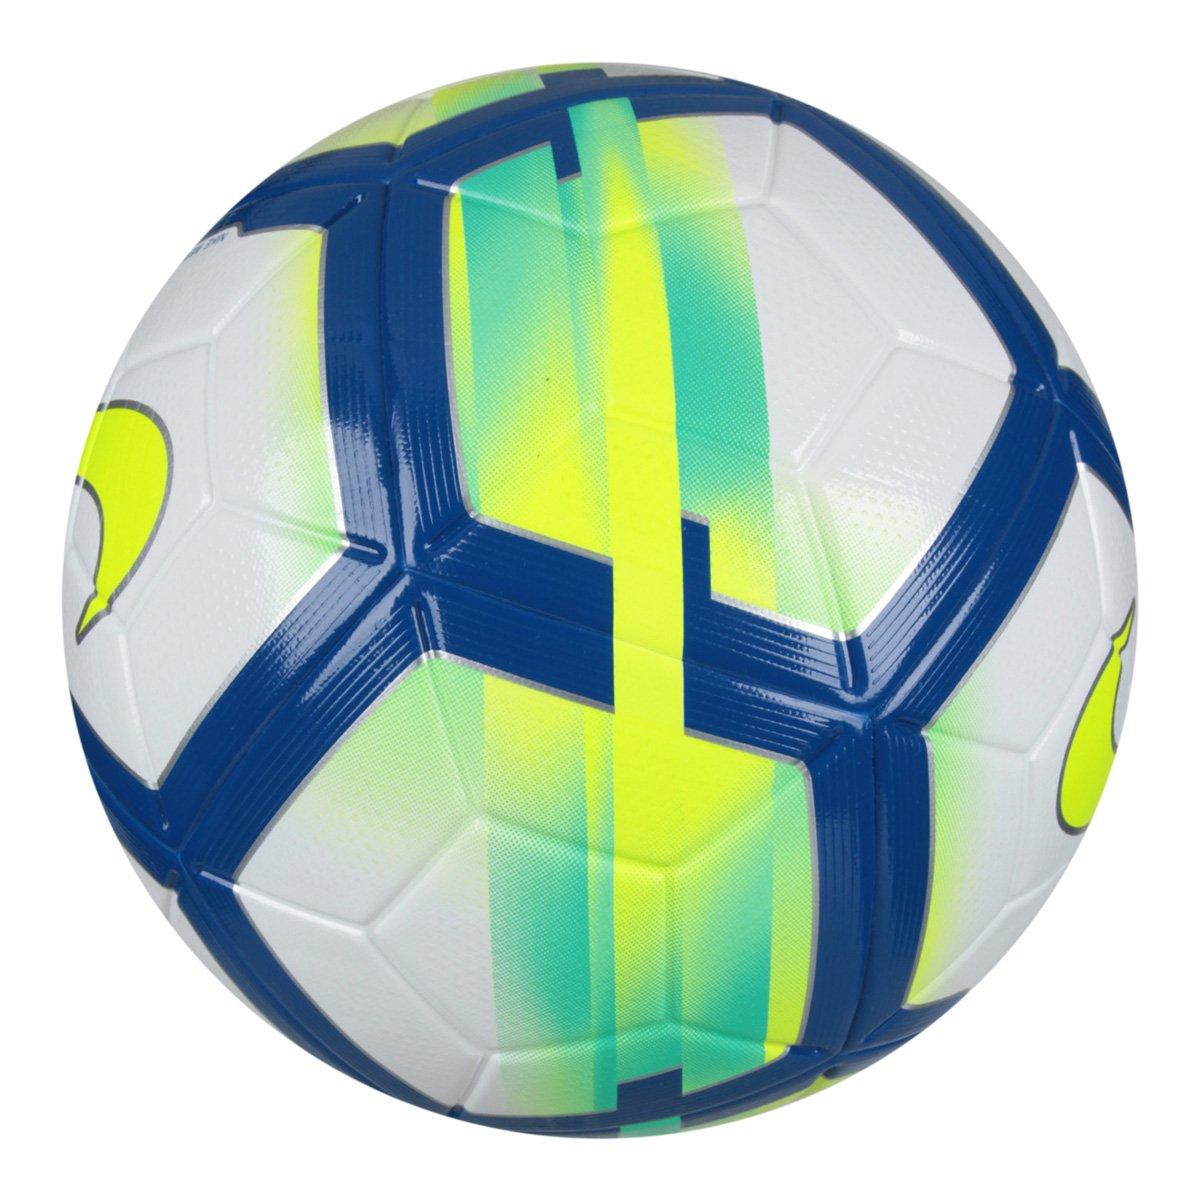 Bola Futebol Campo Nike CBF Ordem Campeonato Brasileiro 2018 ... 7b76d90eb5668